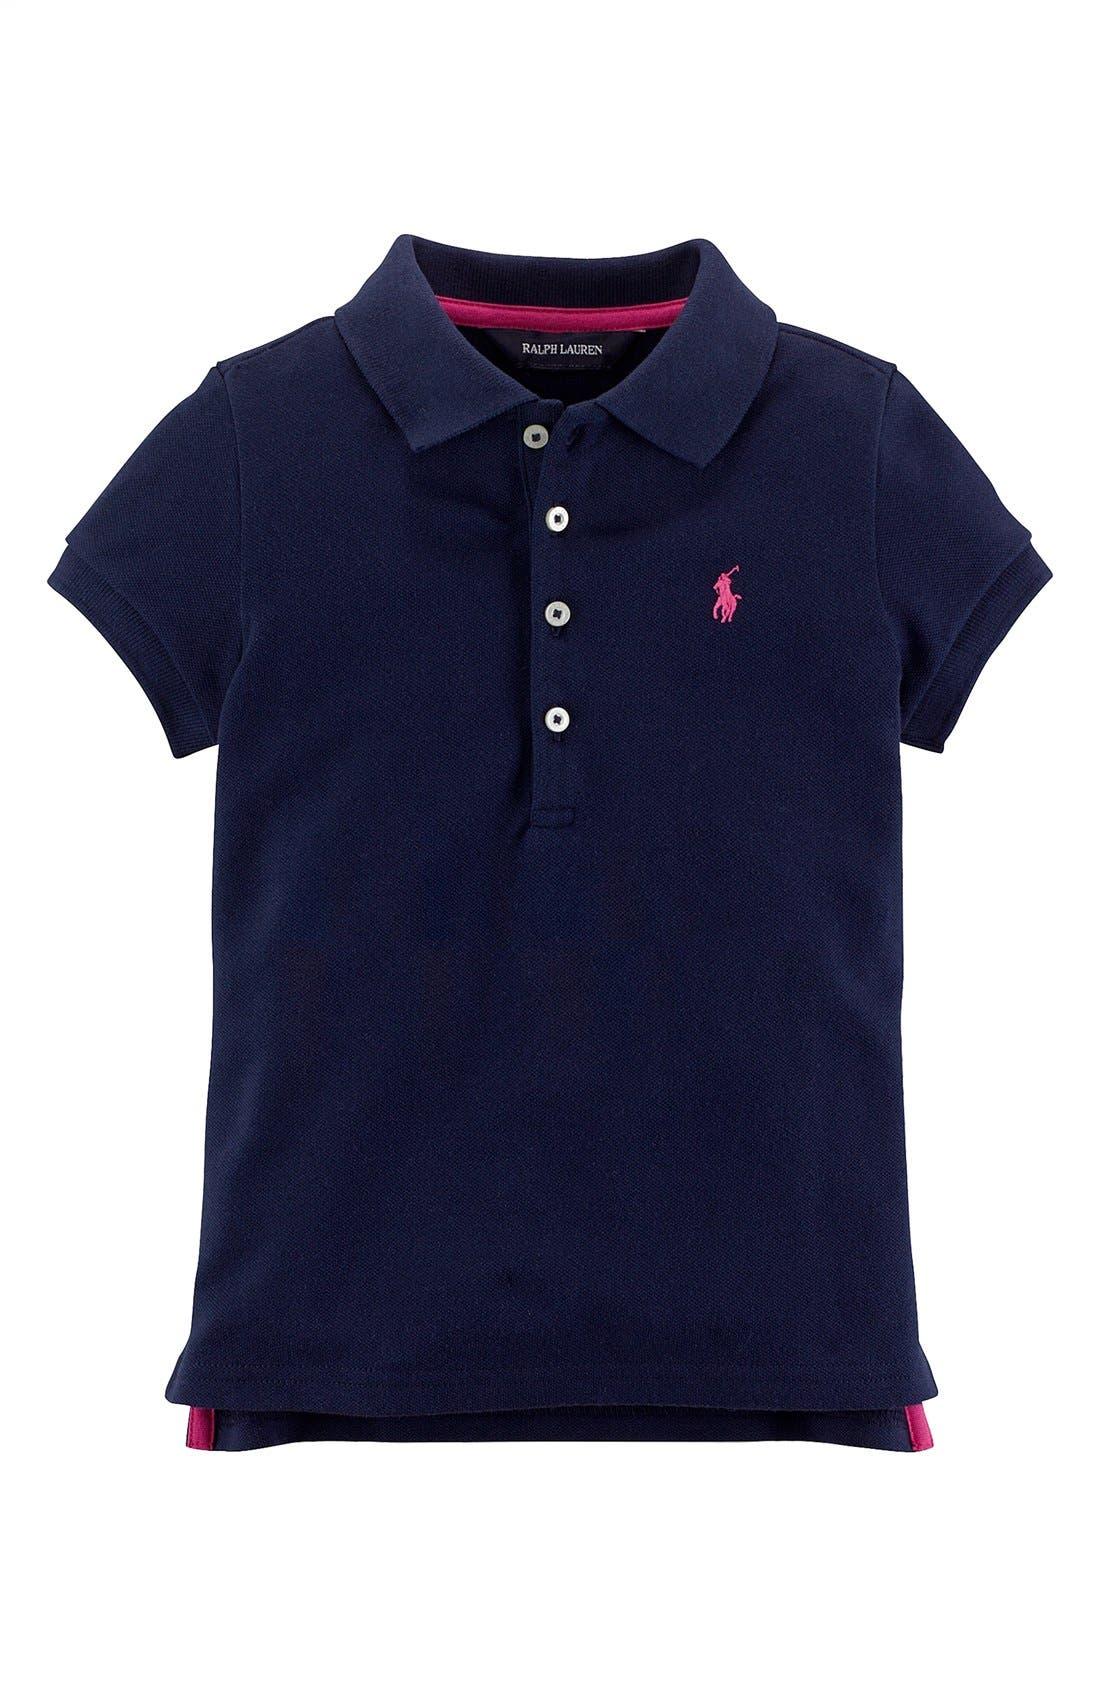 Alternate Image 1 Selected - Ralph Lauren Classic Polo Shirt (Toddler Girls)